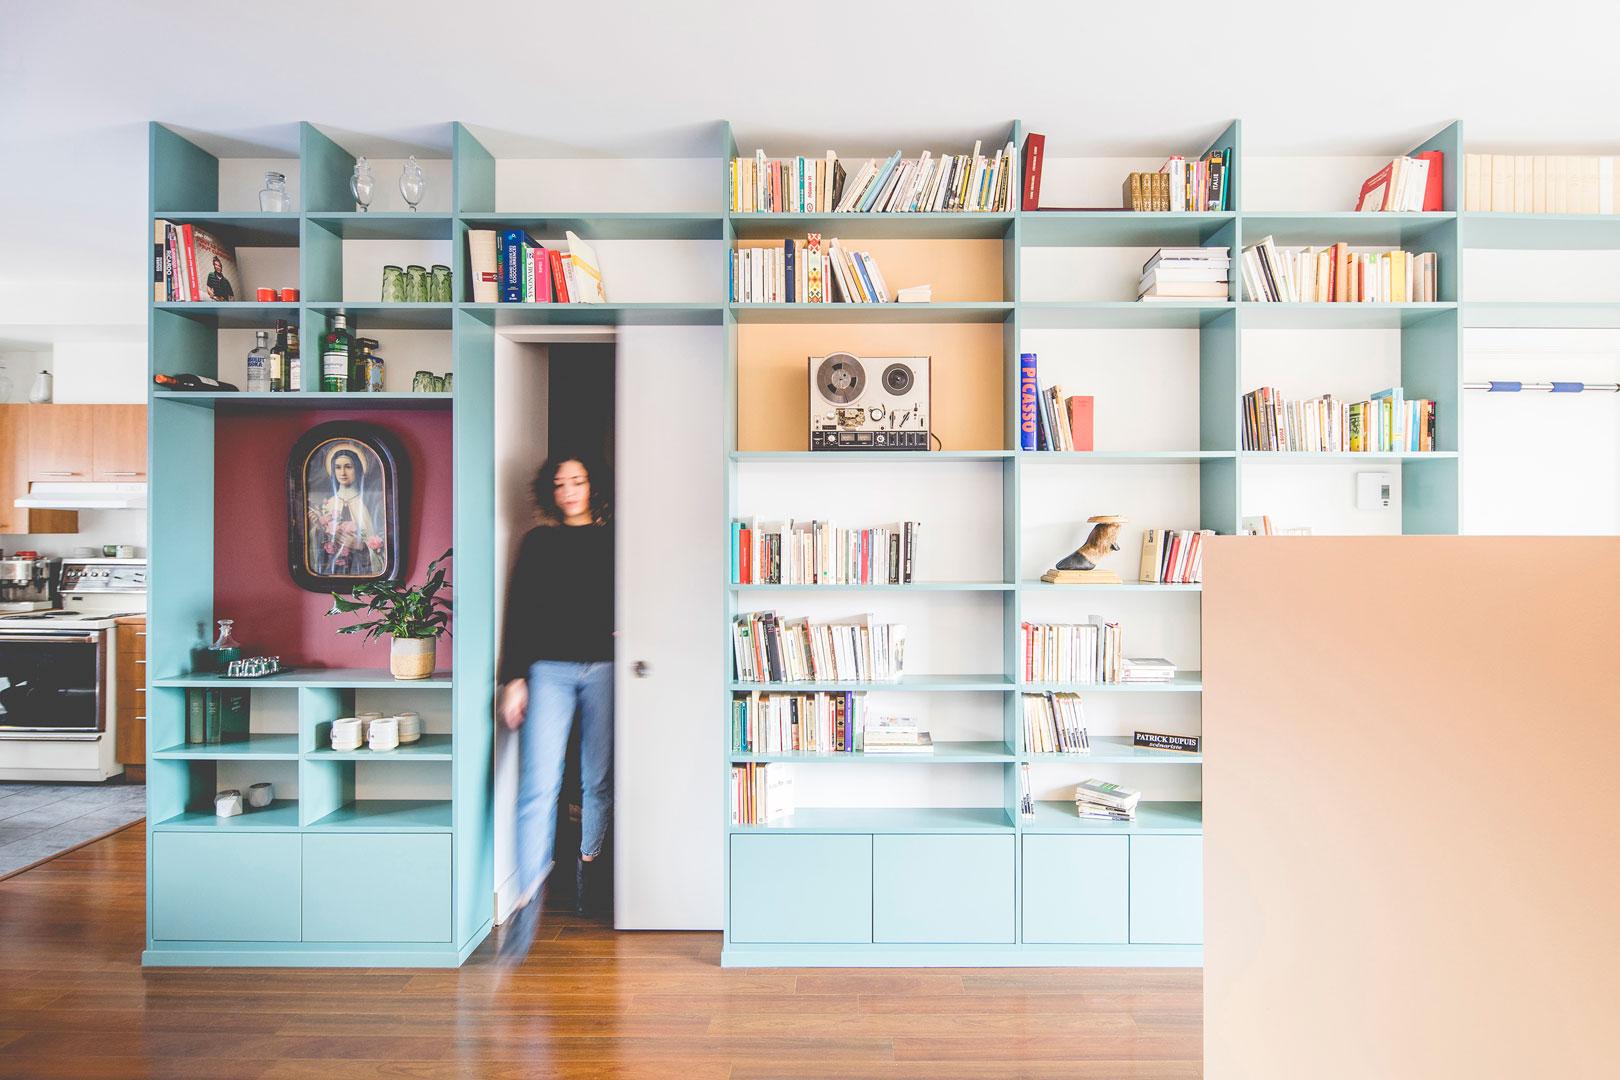 <<<<< BACK  Le mur/biblio de Patrick -  atelier catherine catherine  © Raphaël Thibodeau